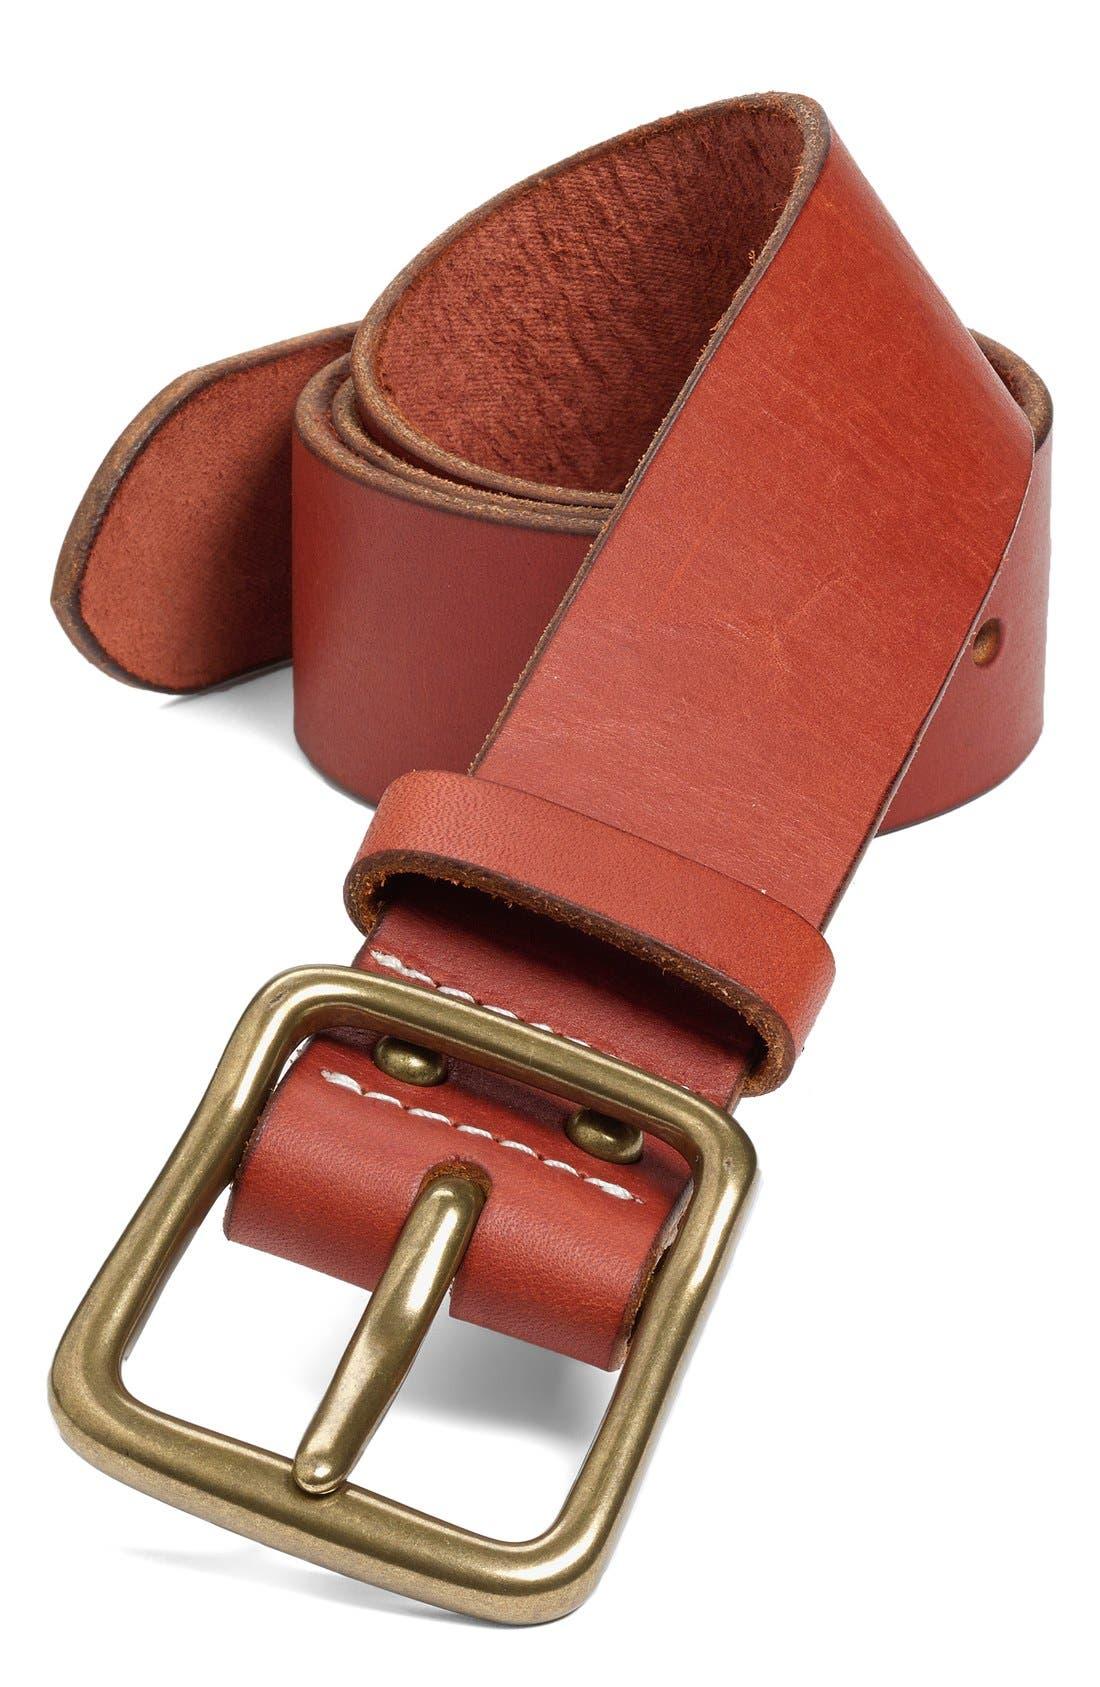 'Pioneer' Belt,                             Main thumbnail 1, color,                             210